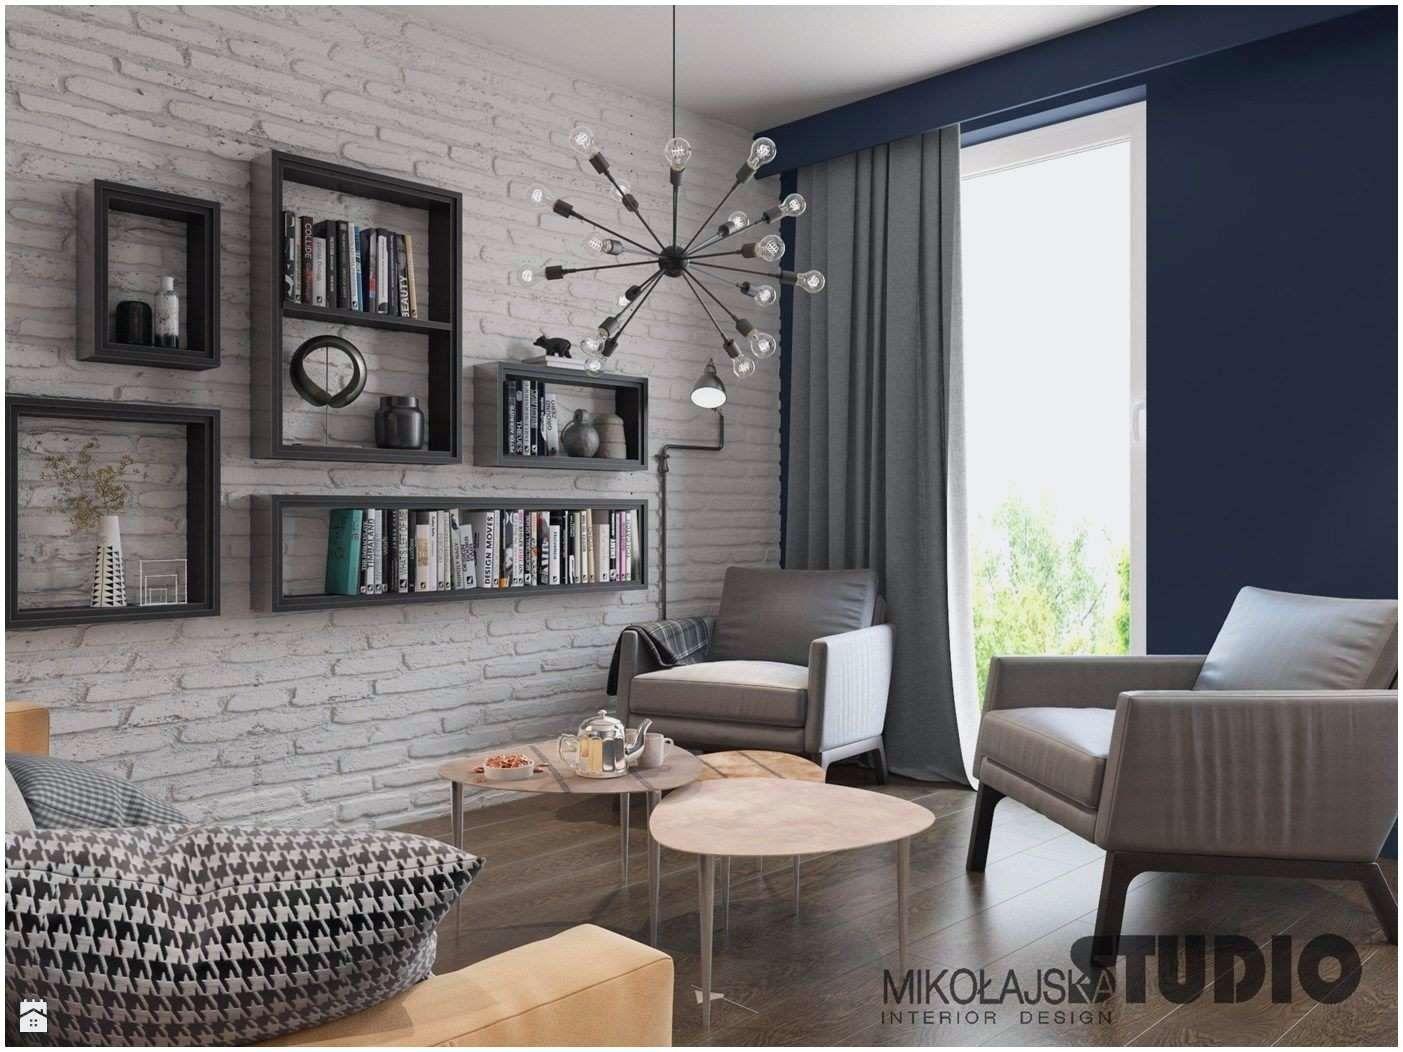 100 Fantastique Concepts Idee Deco Salon Marron Beige